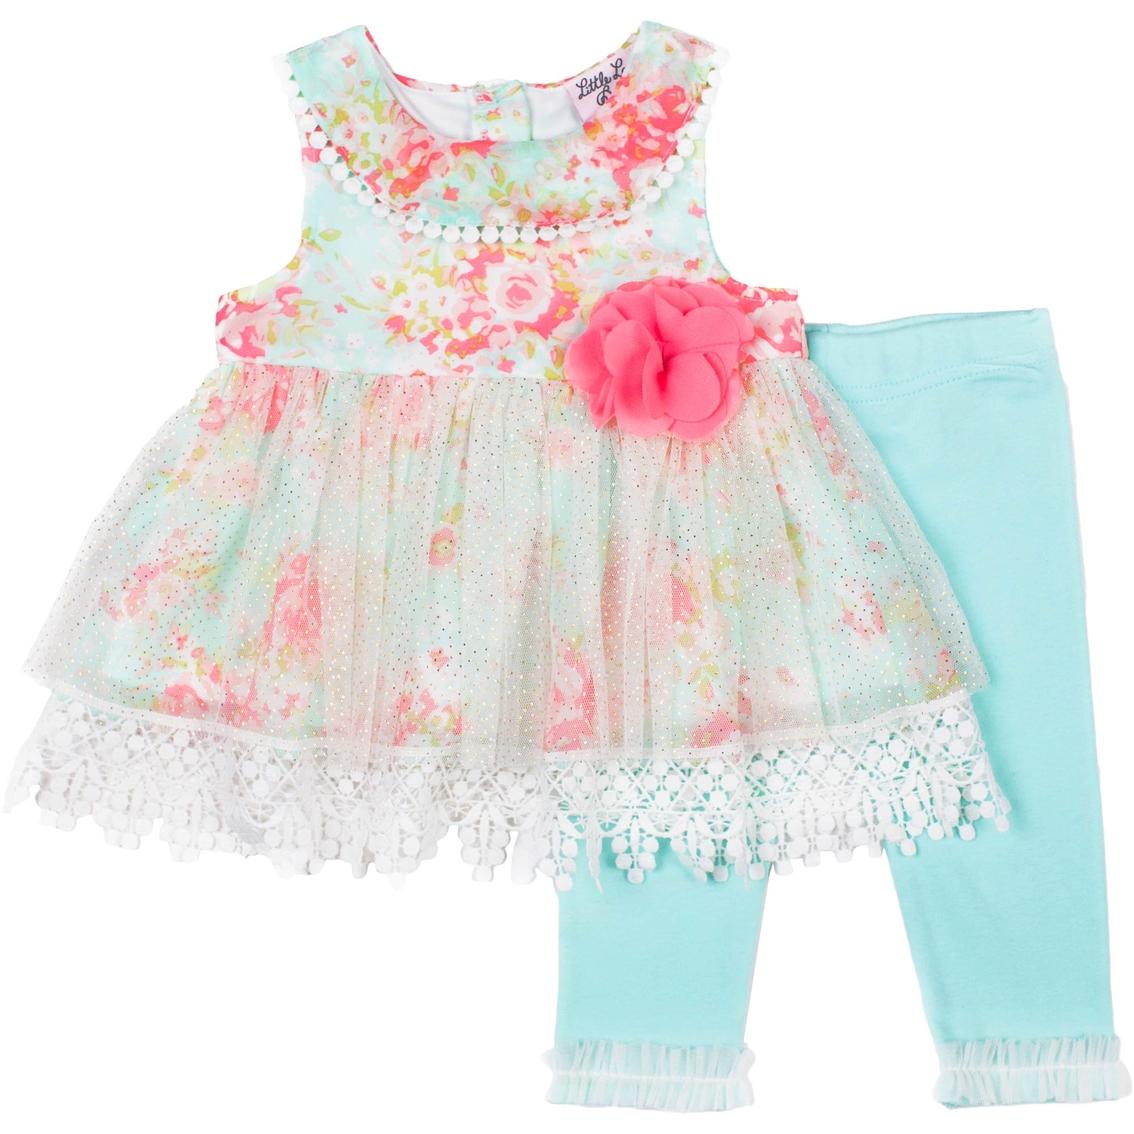 8dc09ca391cf Little Lass Infant Girls 2 Pc Capri Set | Baby Girl 0-24 Months ...